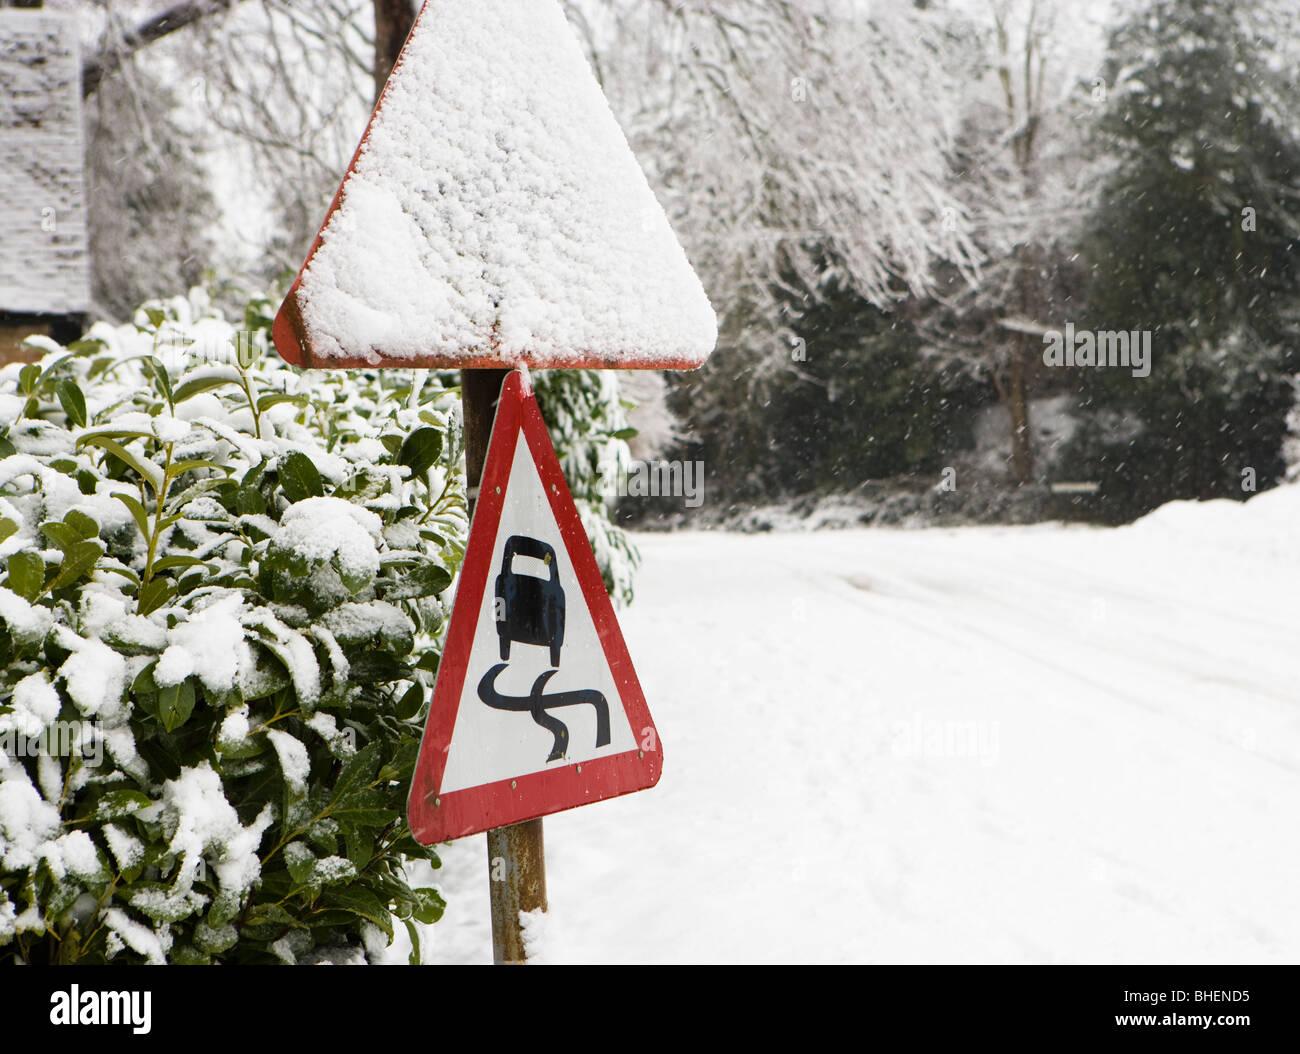 Danger, slippery road sign in winter. - Stock Image